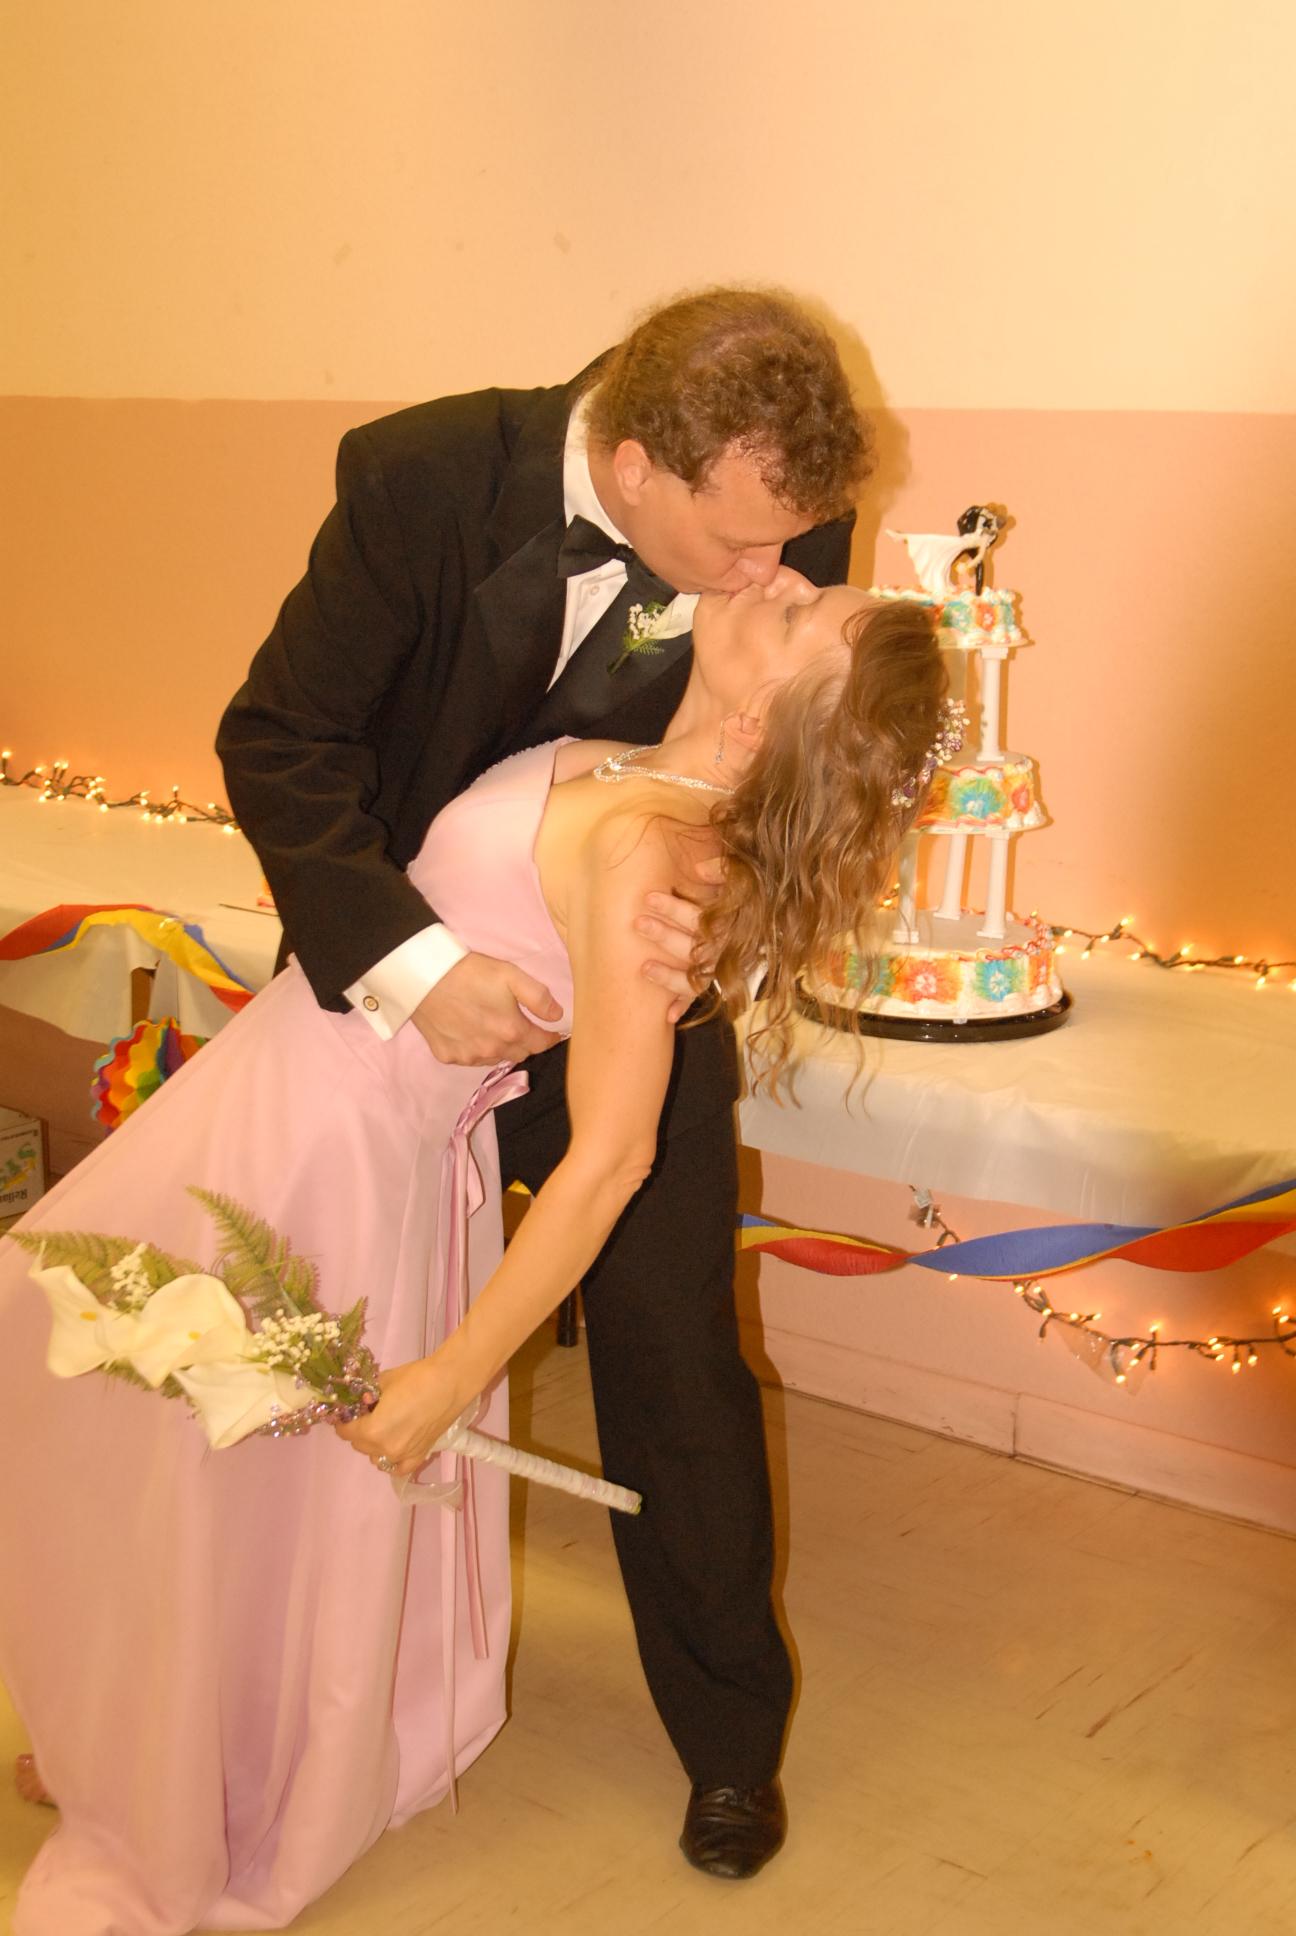 emily-and-travis-4-1-2013-april-fools-wedding-2-452